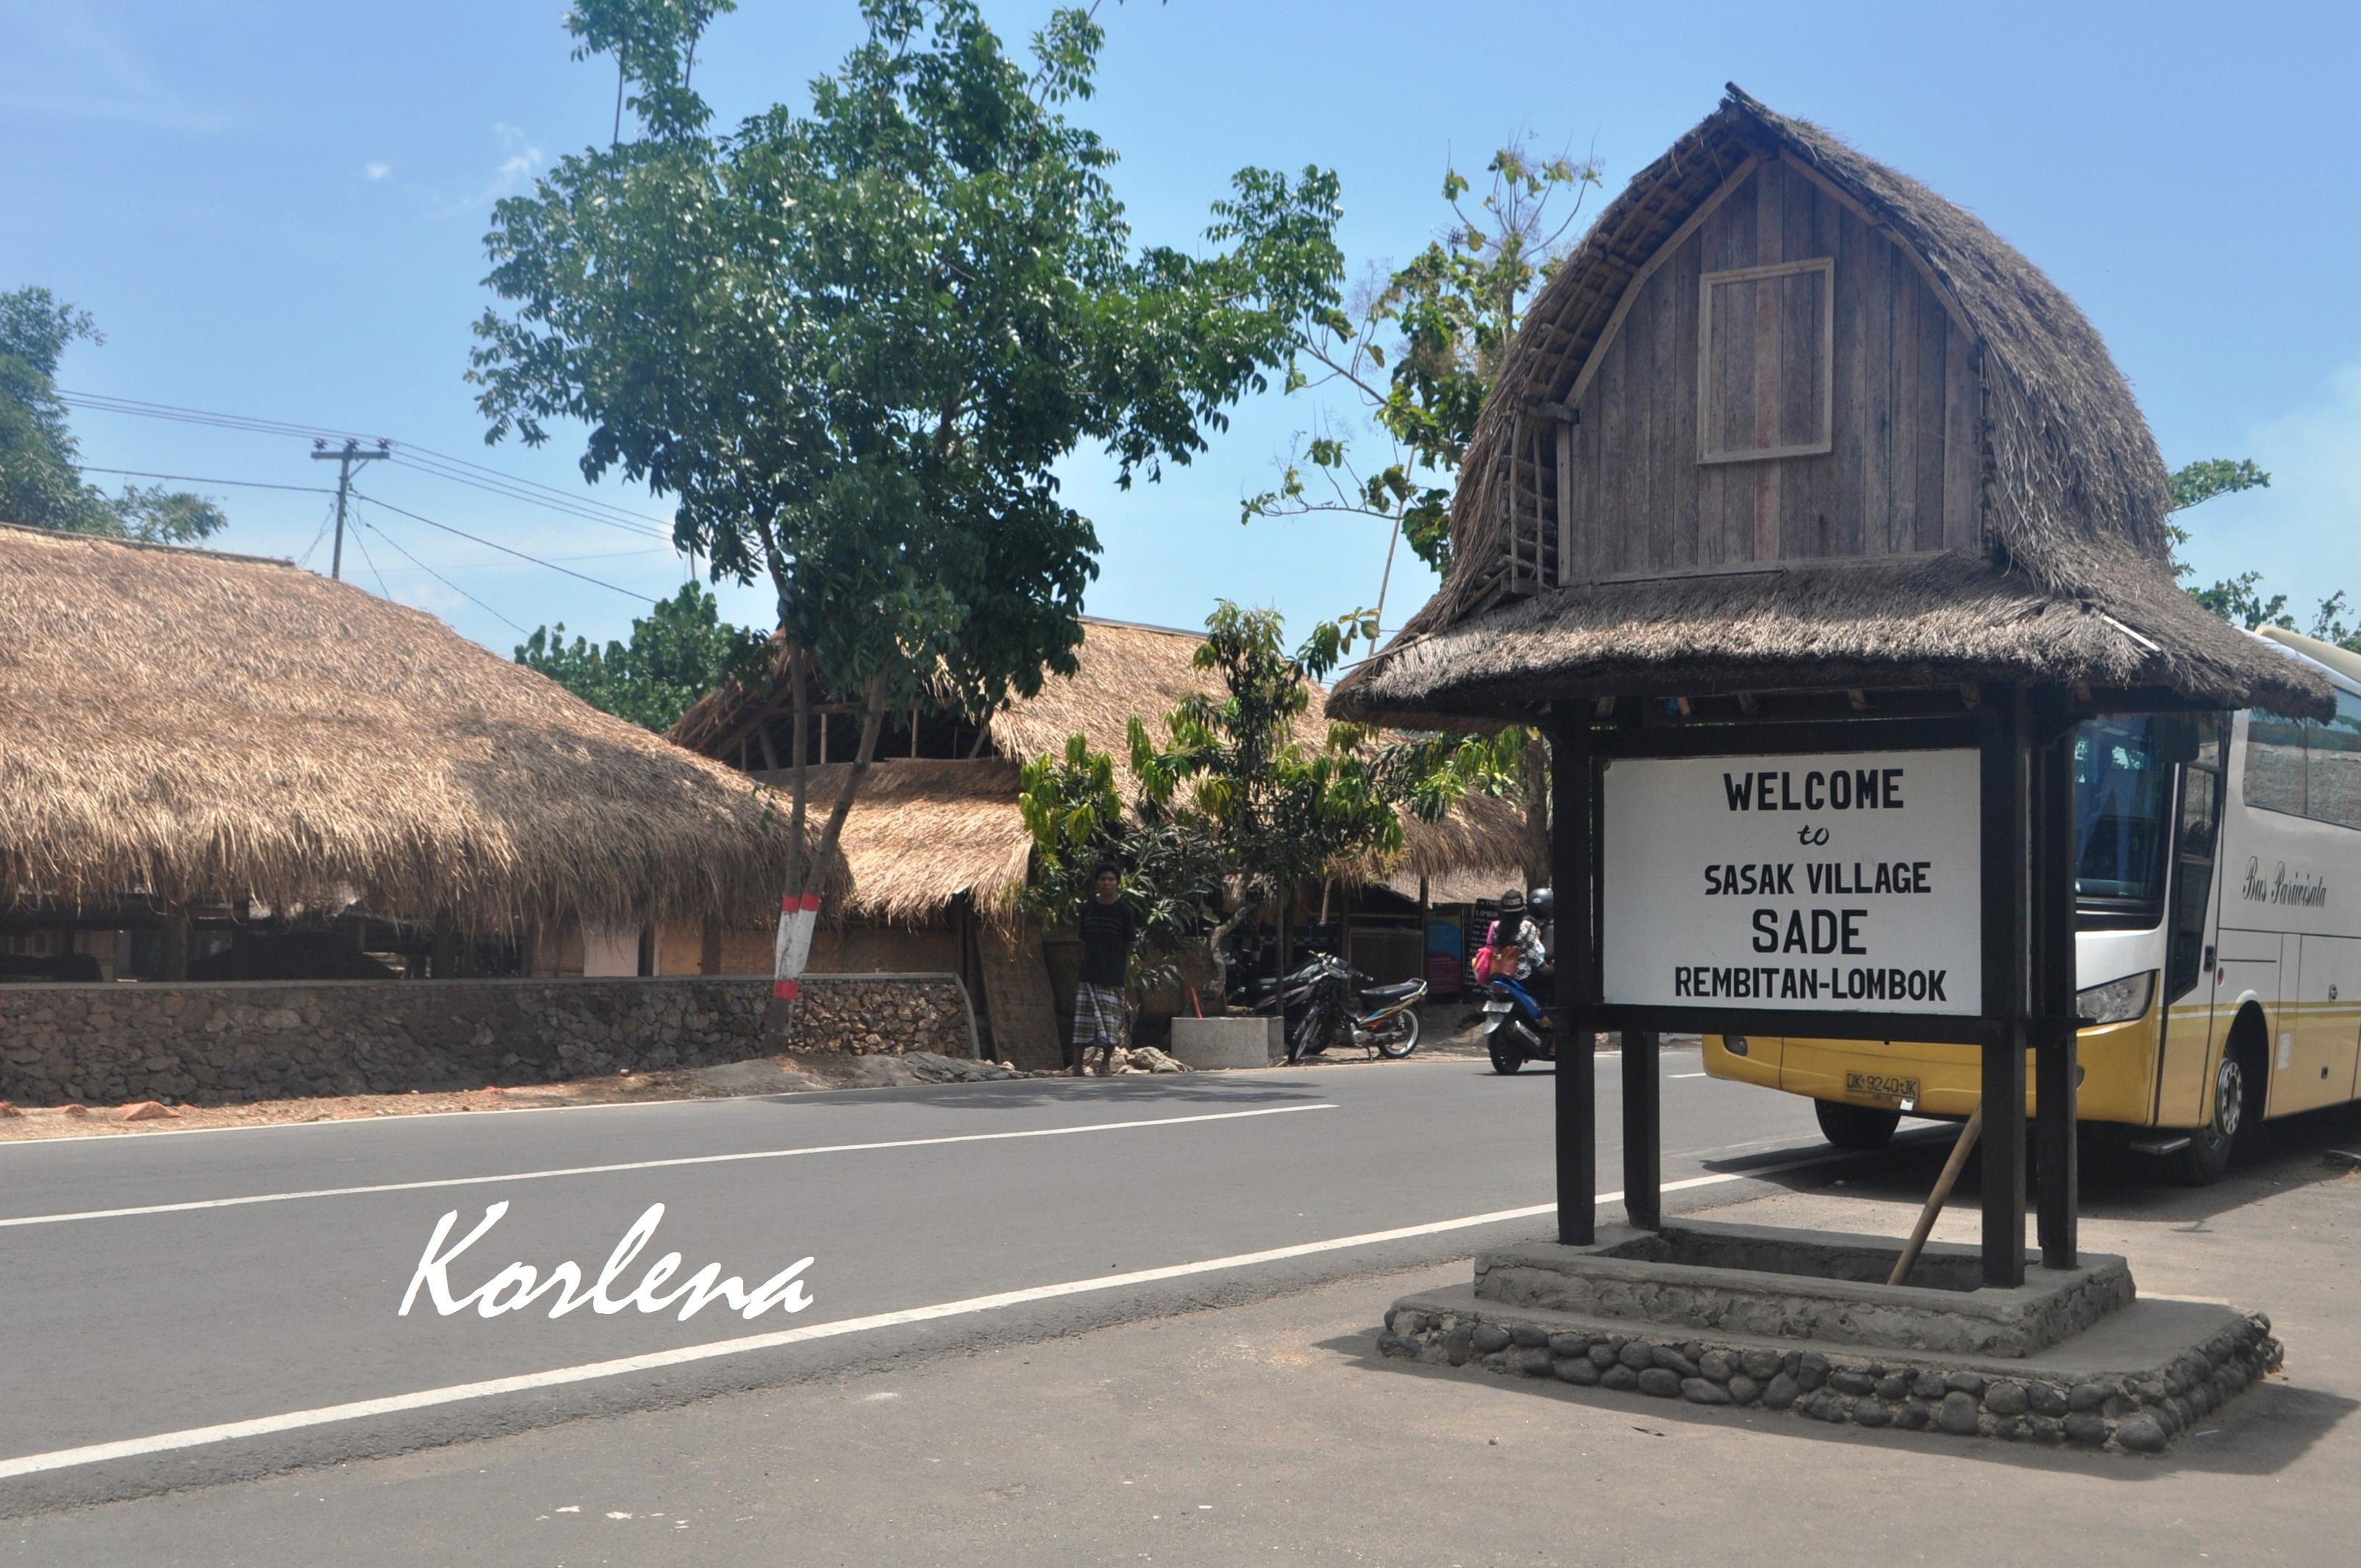 Lombok Bag 1 Beratap Ilalang Kering Desa Sade Tengah Kecamatan